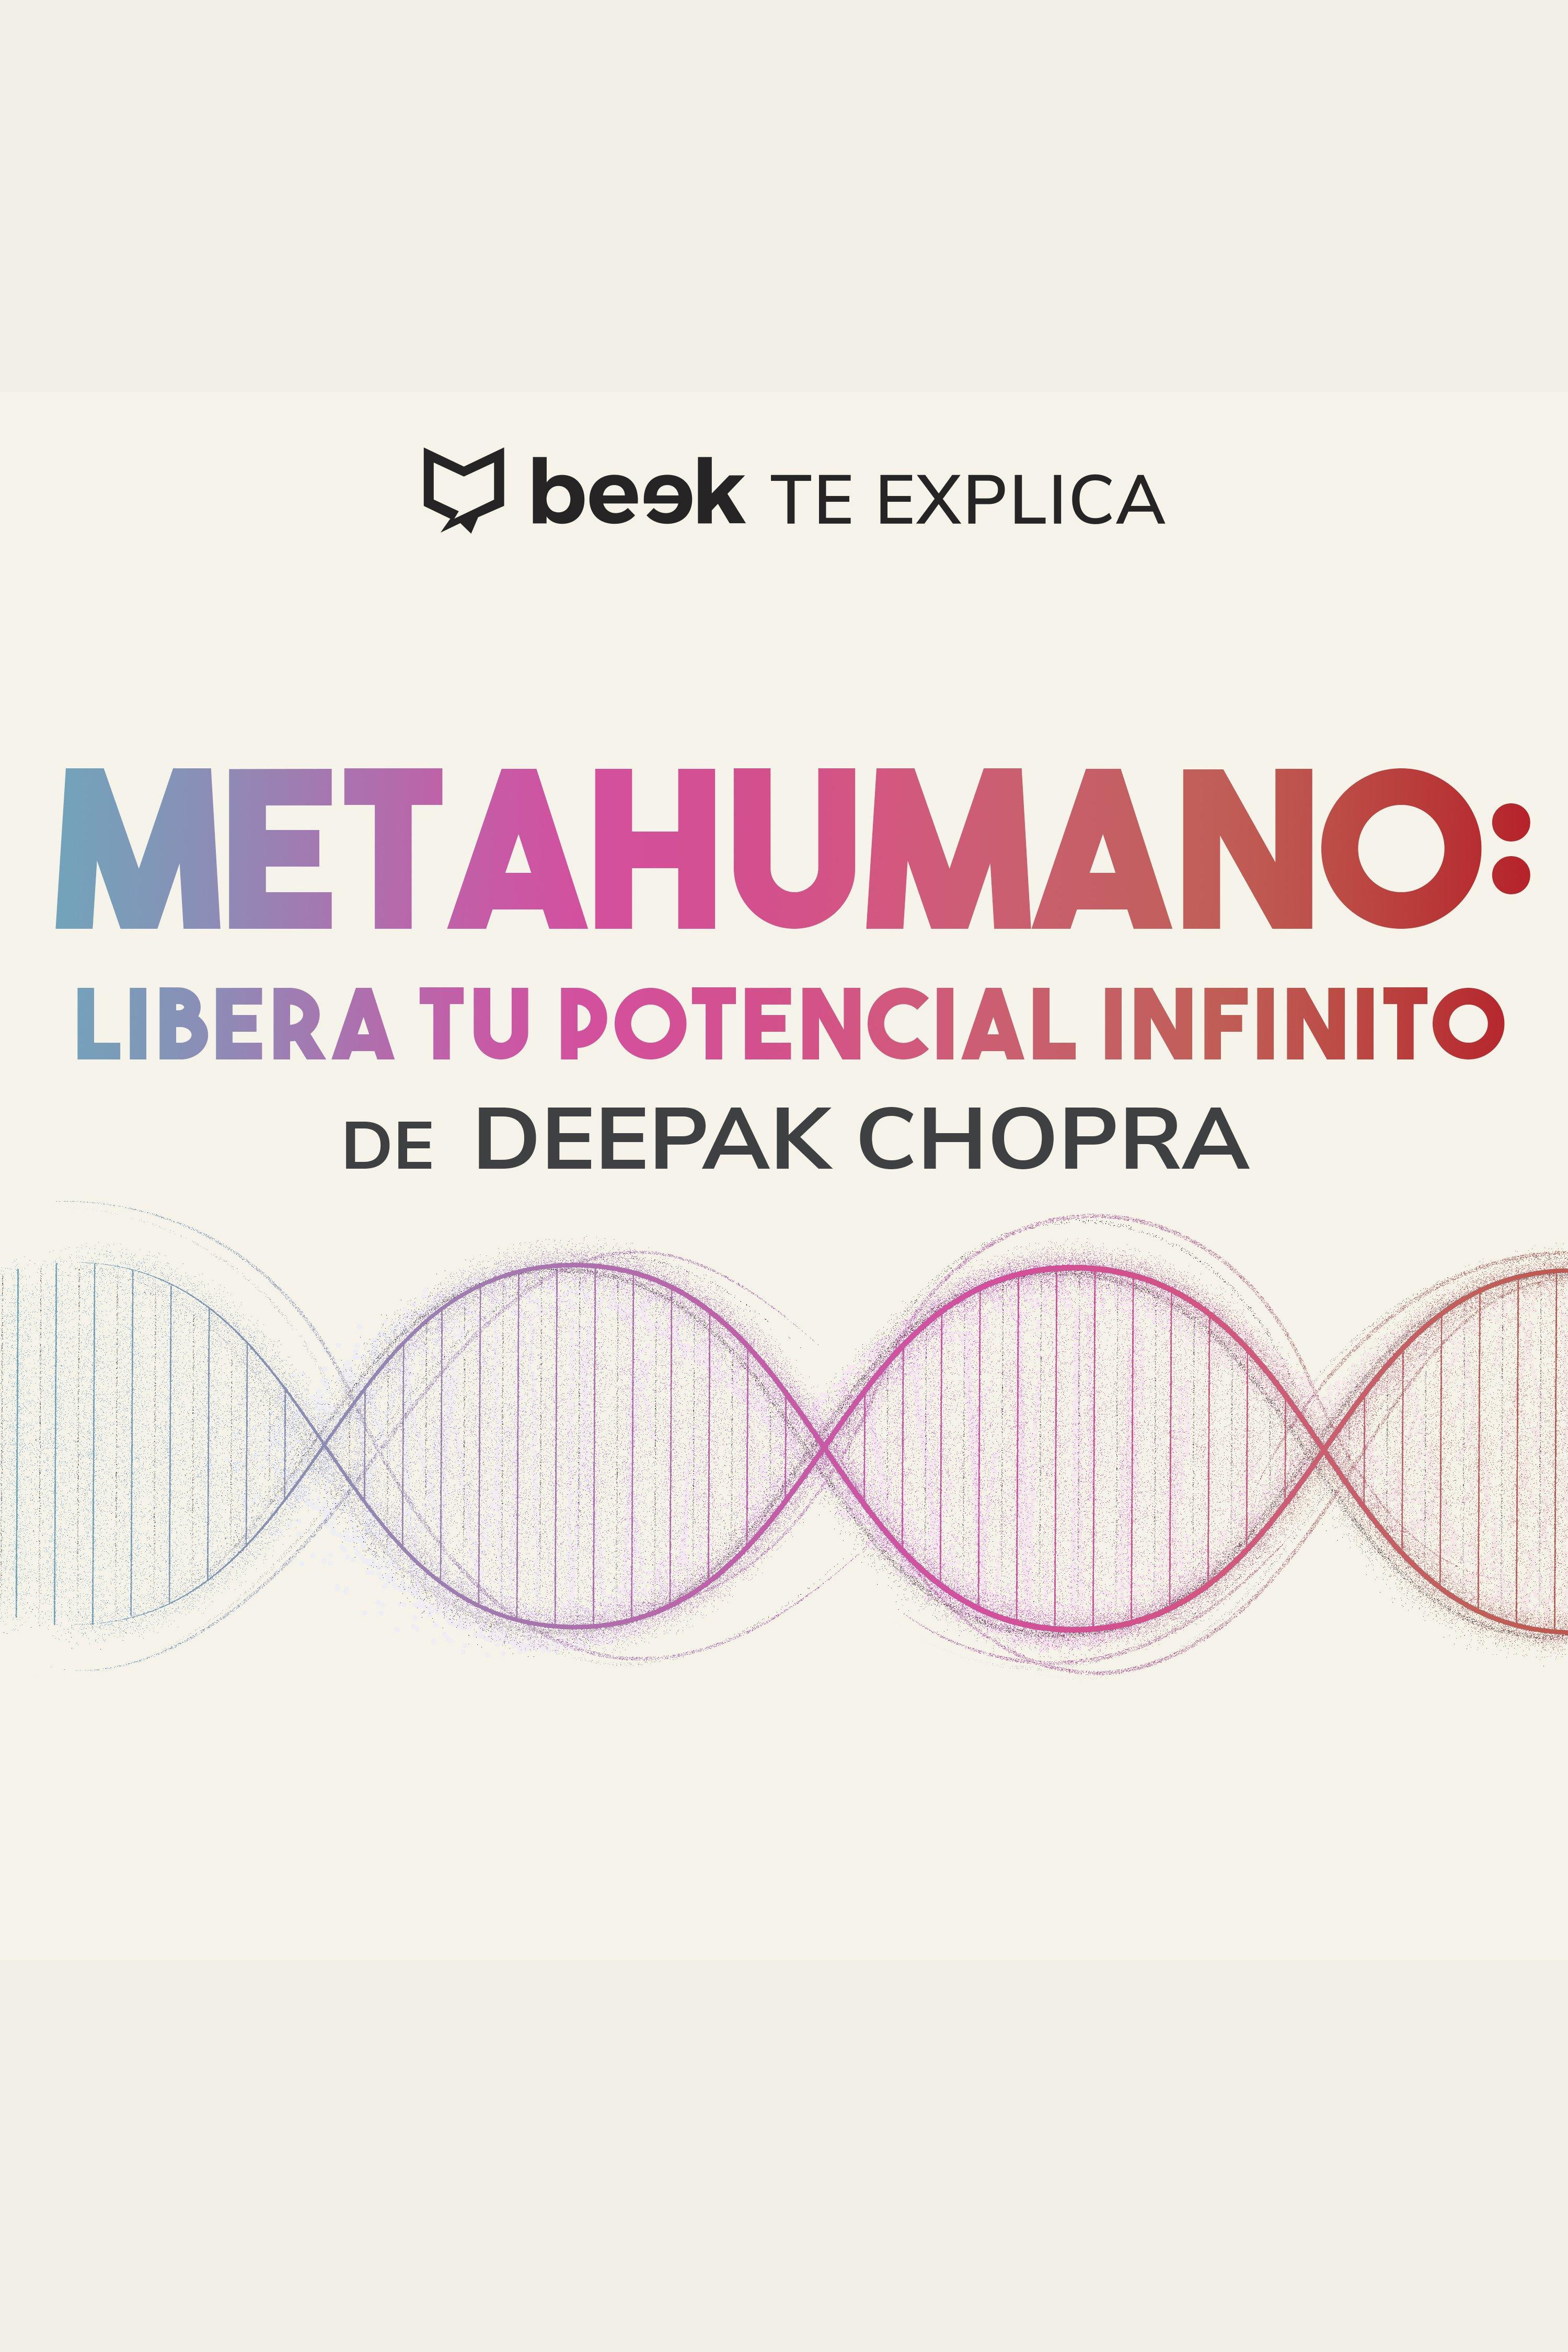 Esta es la portada del audiolibro Metahumano: Libera tu potencial infinito… Beek te explica